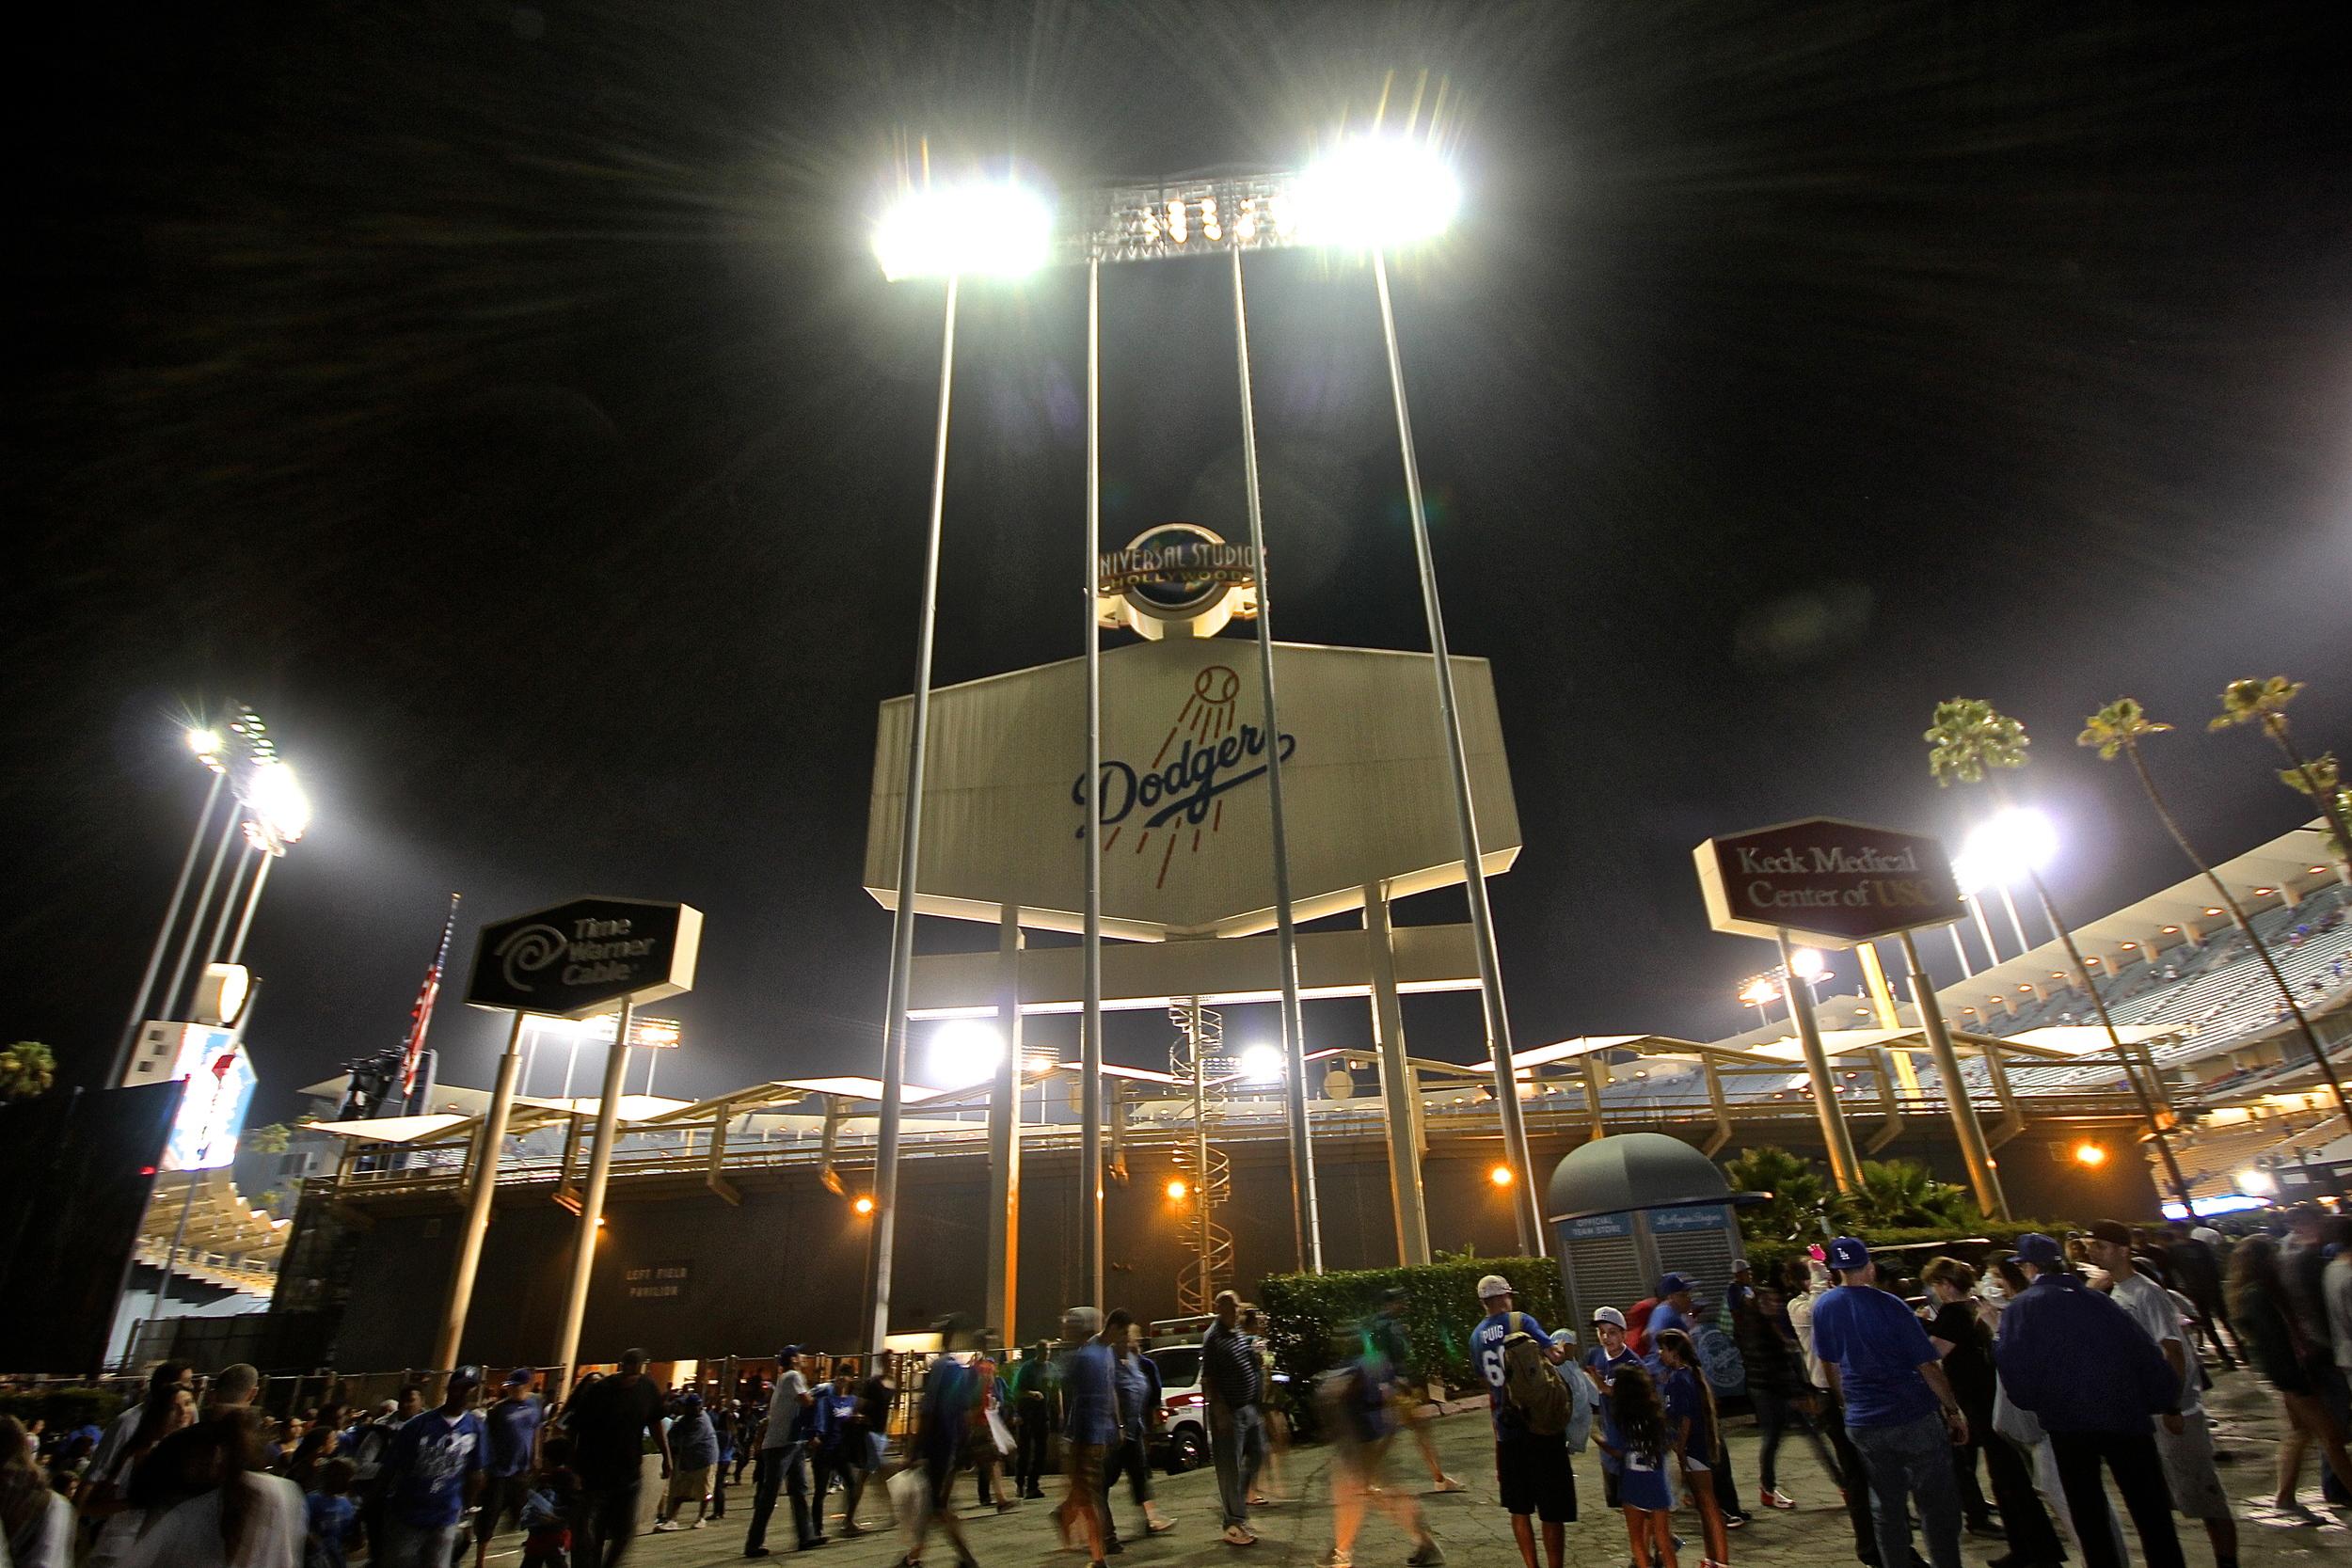 Good night Dodgers Stadium